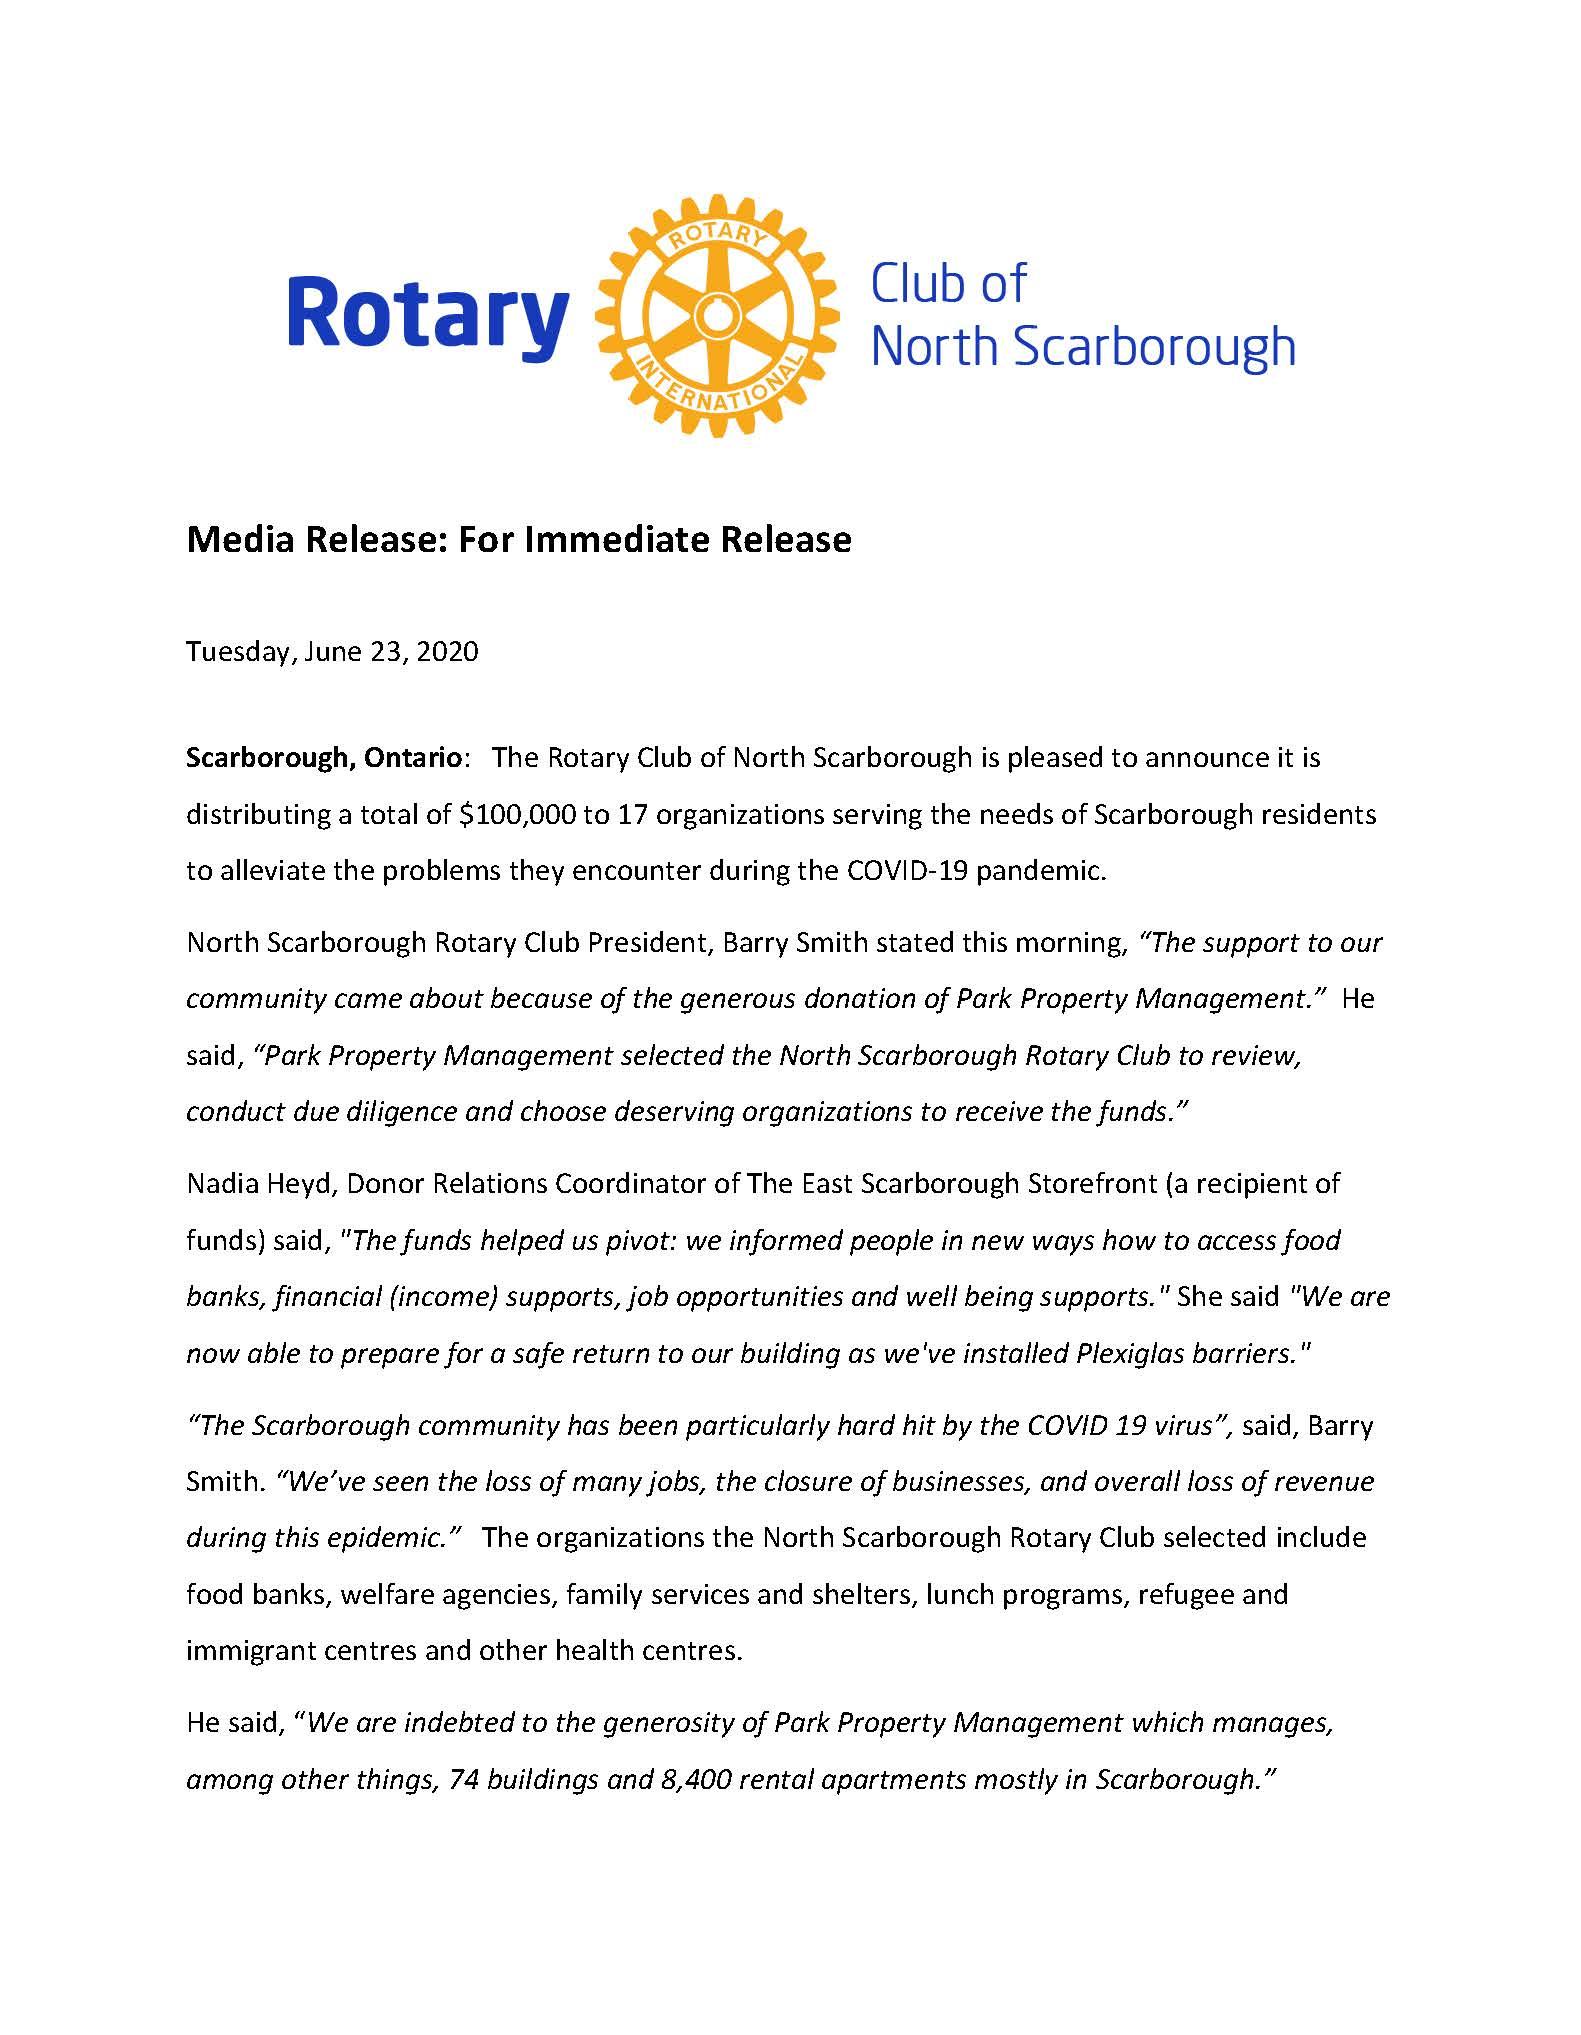 Rotary Club of North Scarborough - Rotary Club of North Scarborough